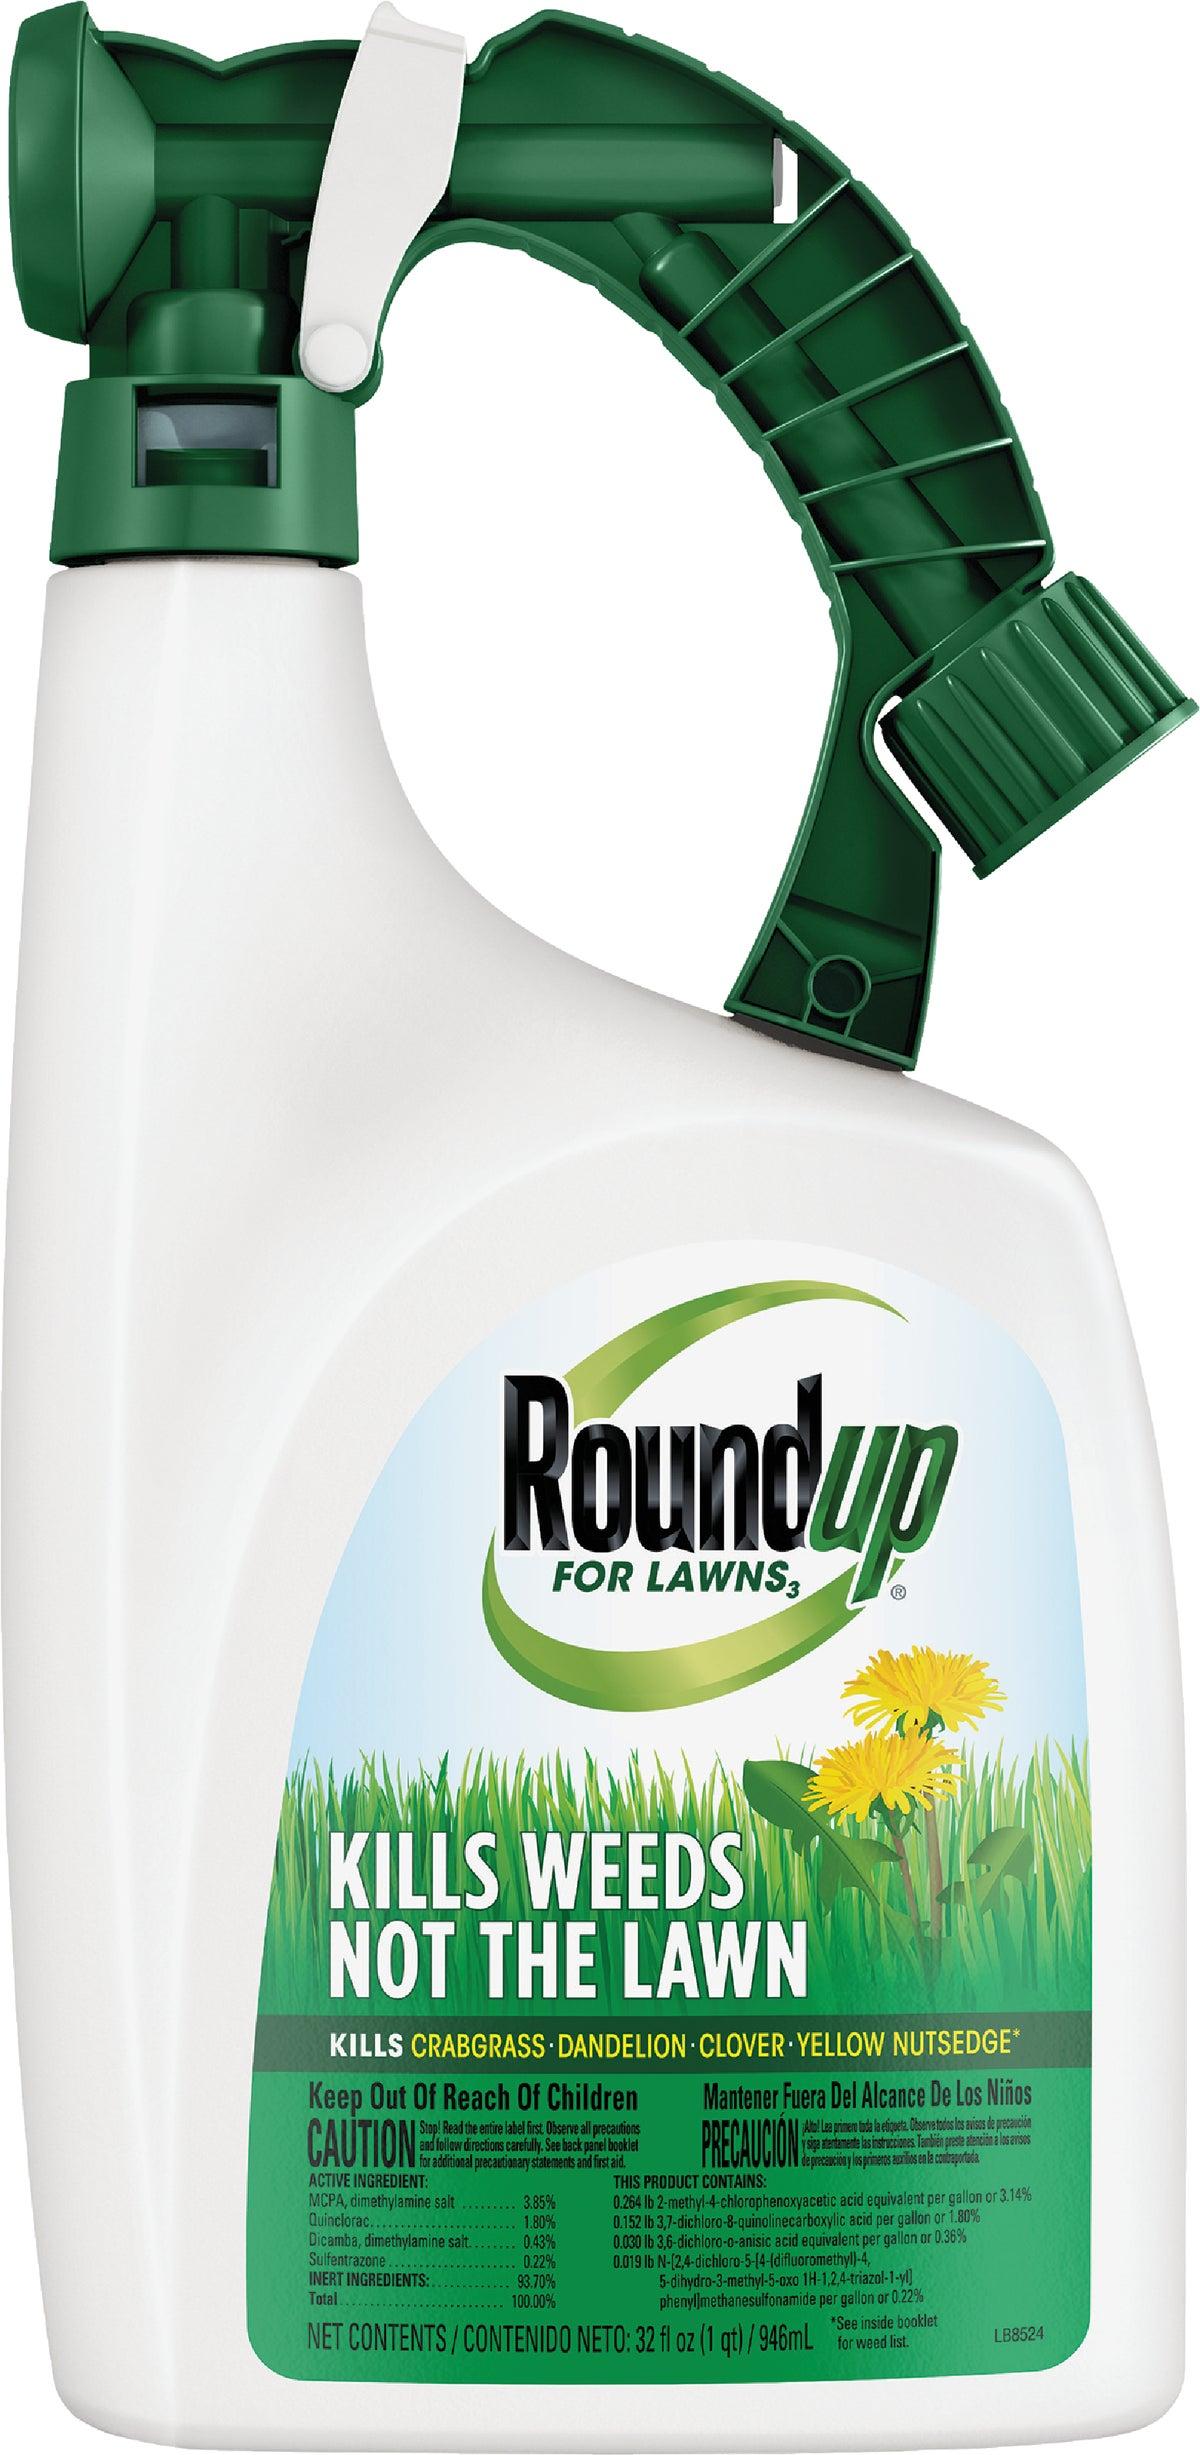 Buy Roundup For Lawns Northern Formula Weed Killer 32 Oz ...